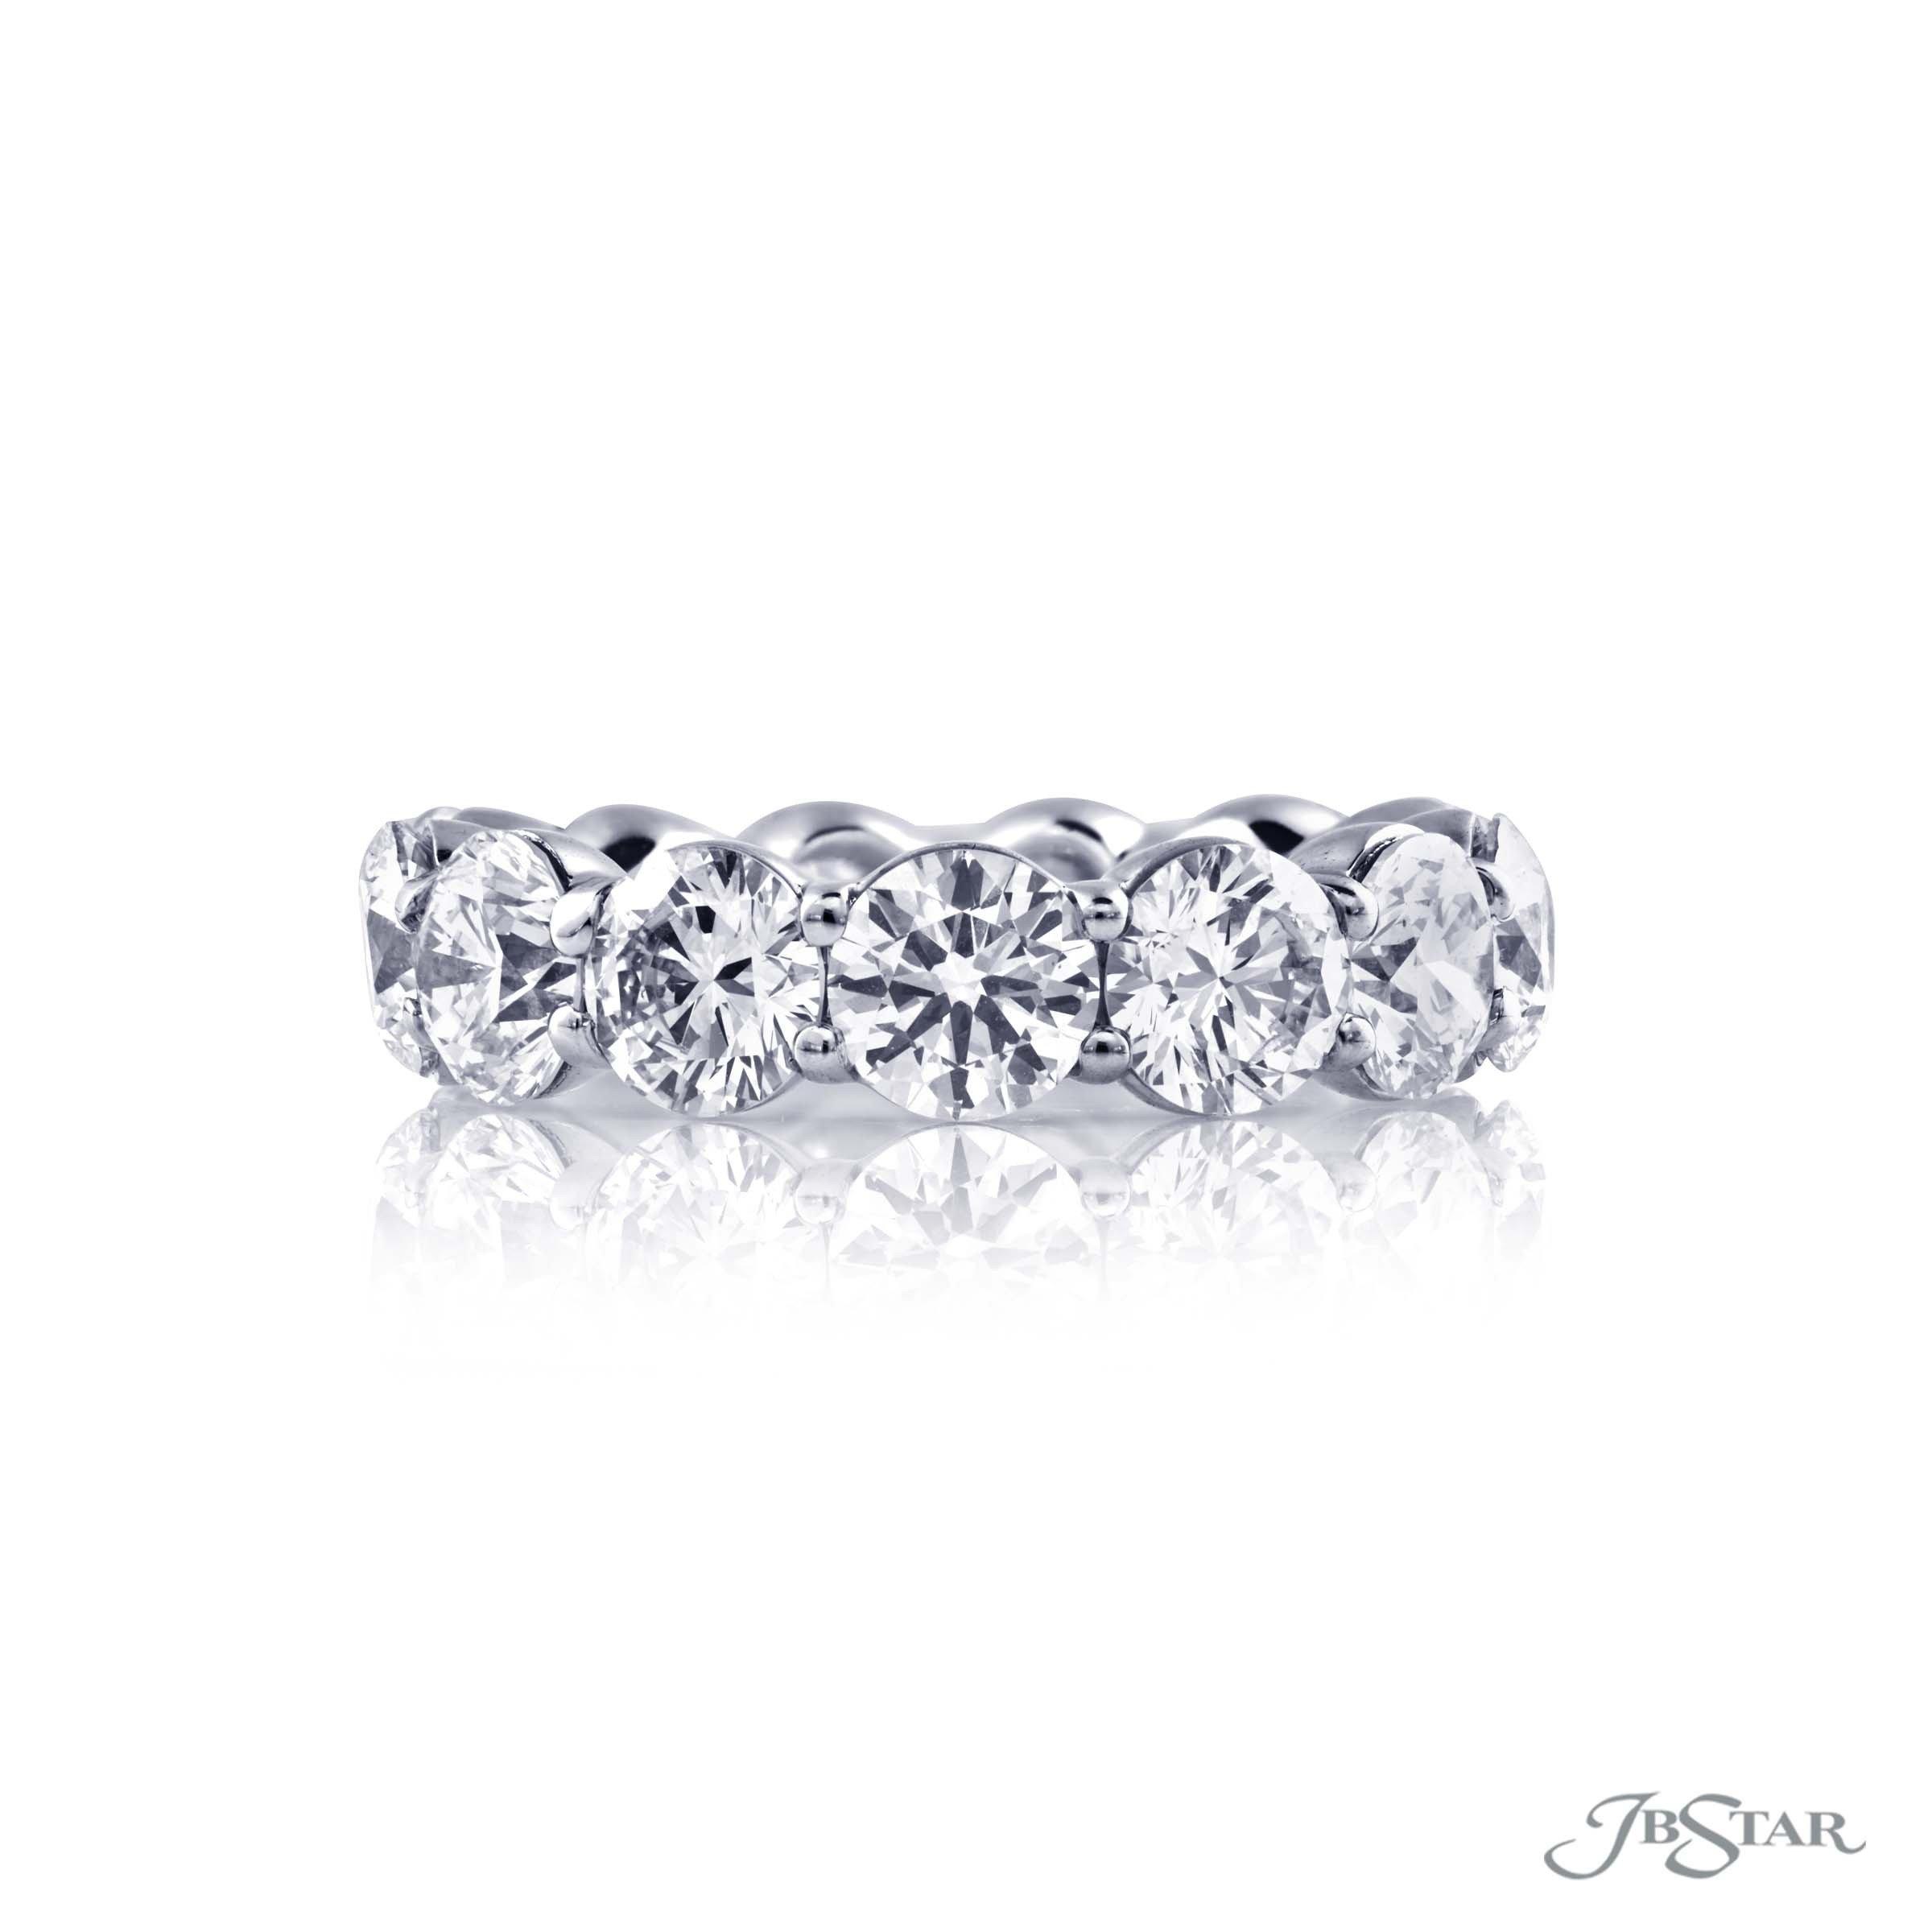 JB Star Round Diamond Platinum Eternity Ring 6.81 cts - alternate